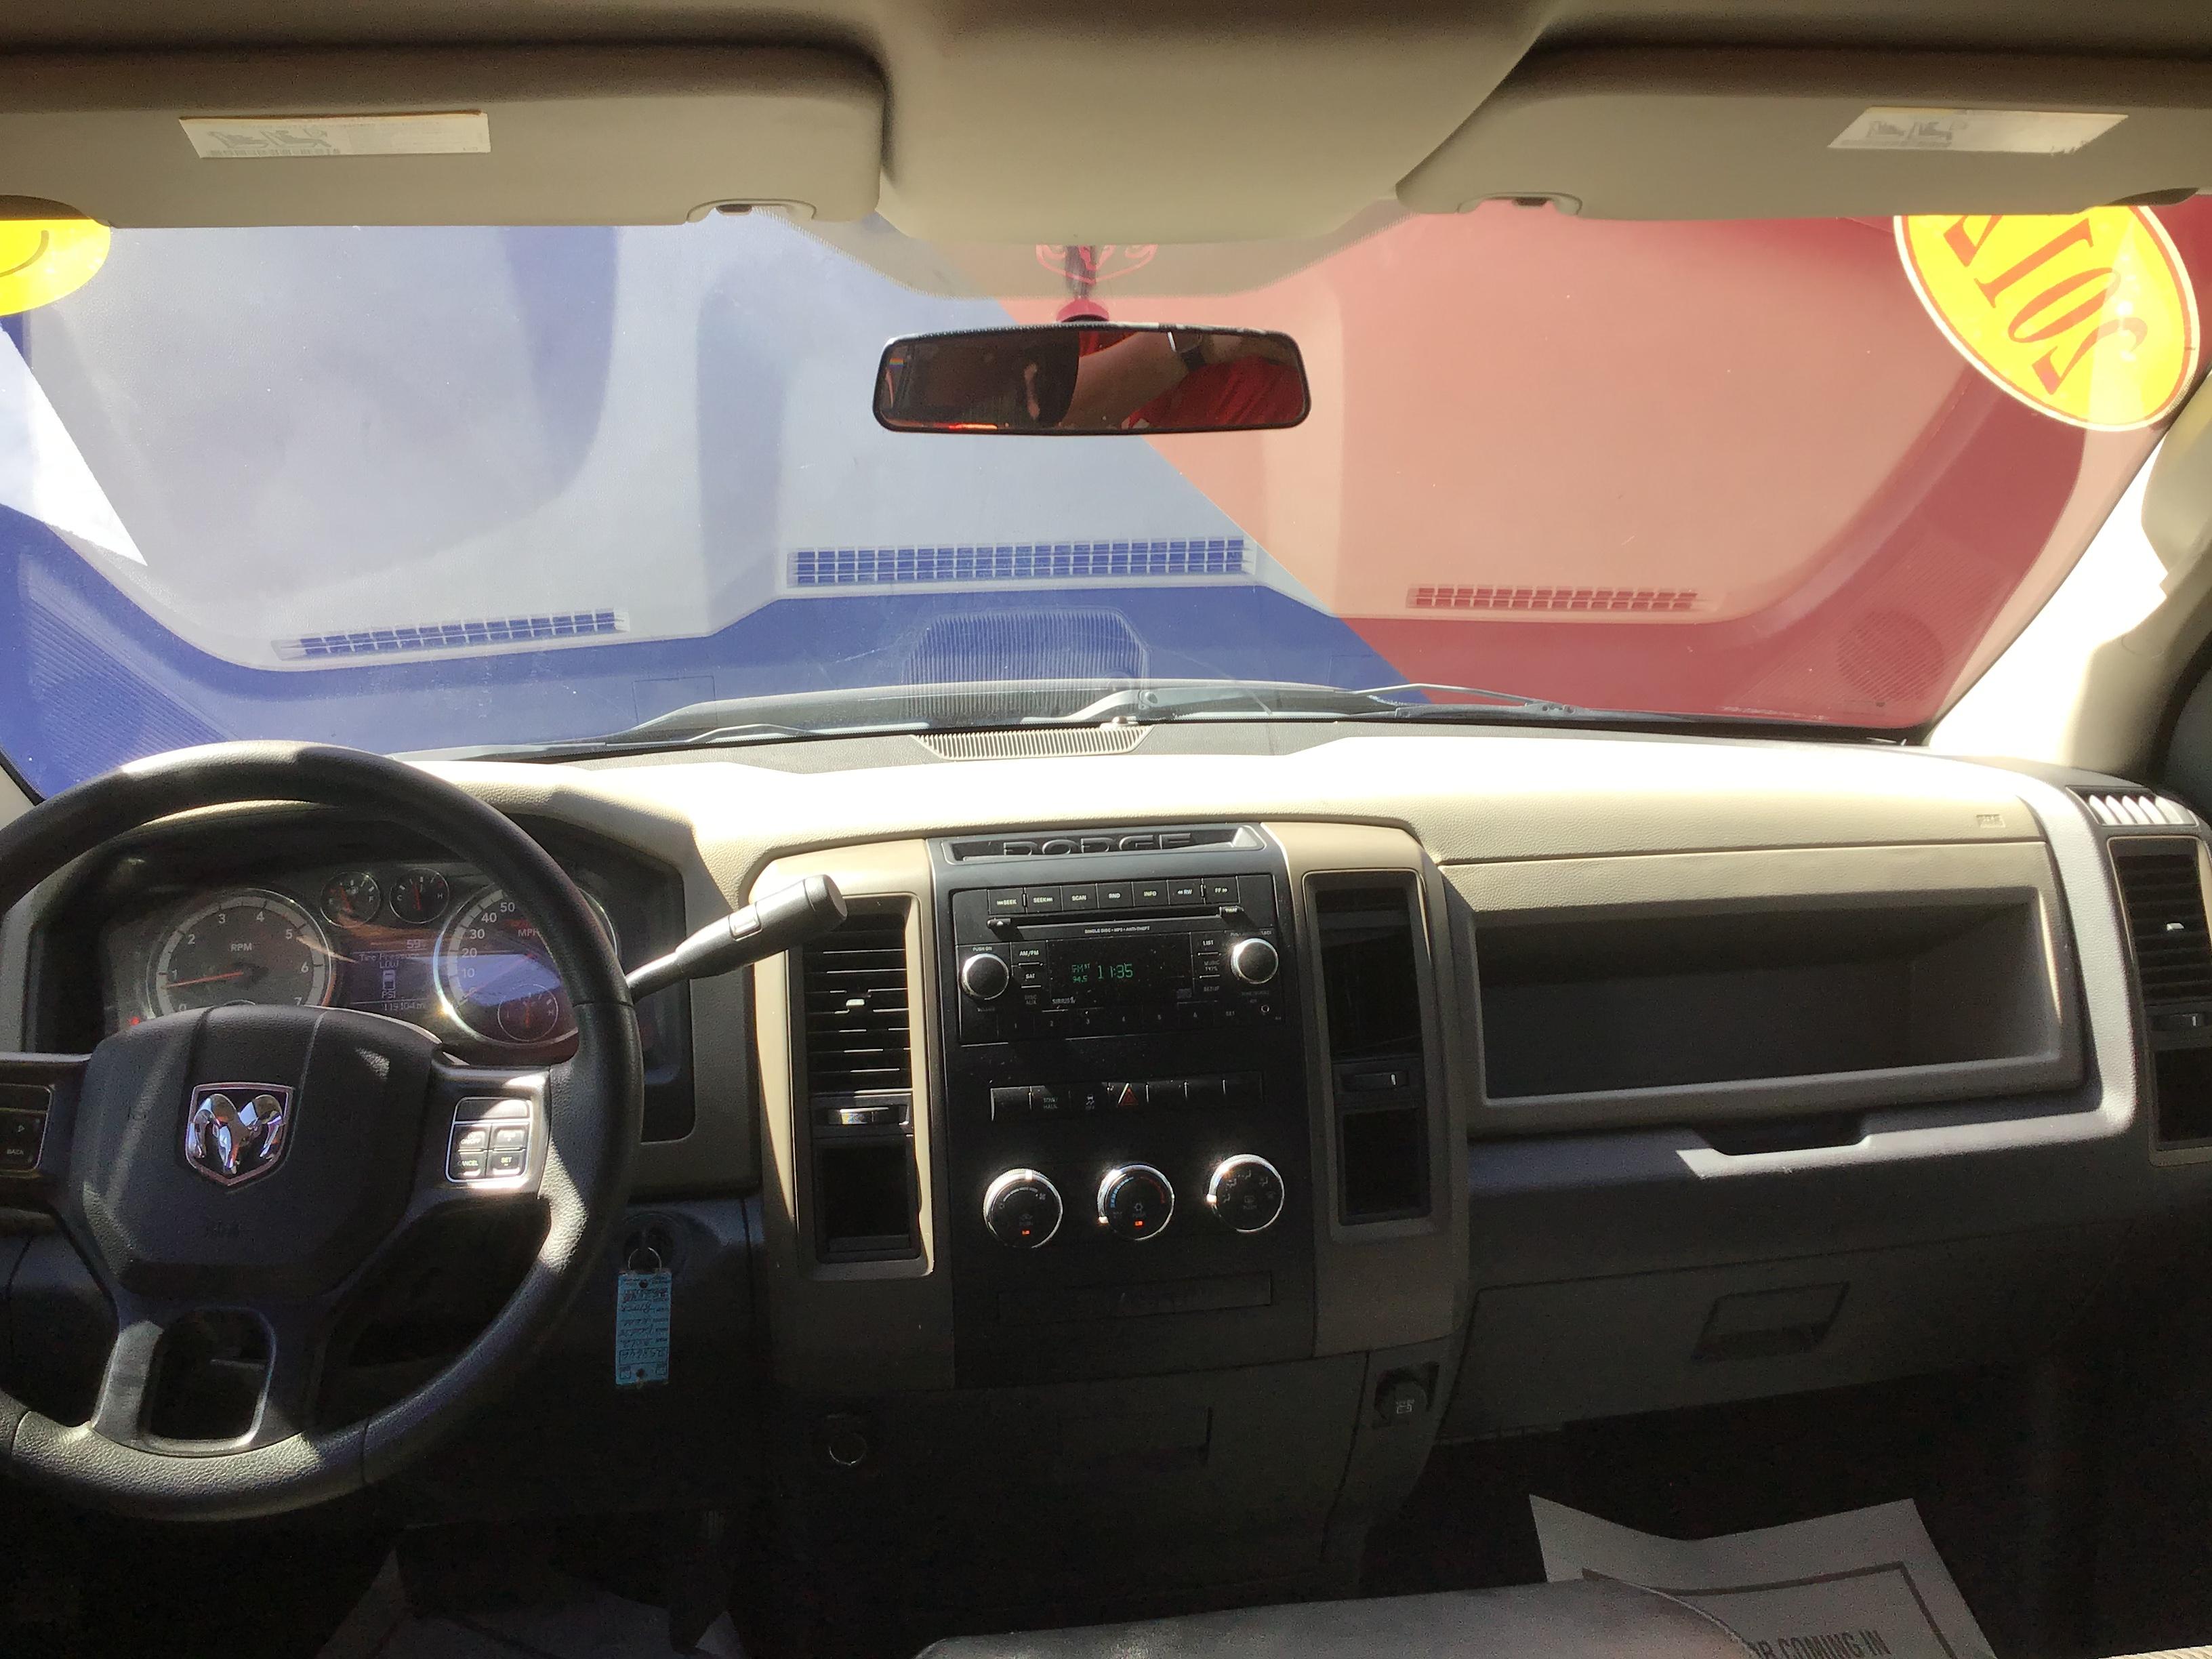 used vehicle - Truck RAM 1500 2012